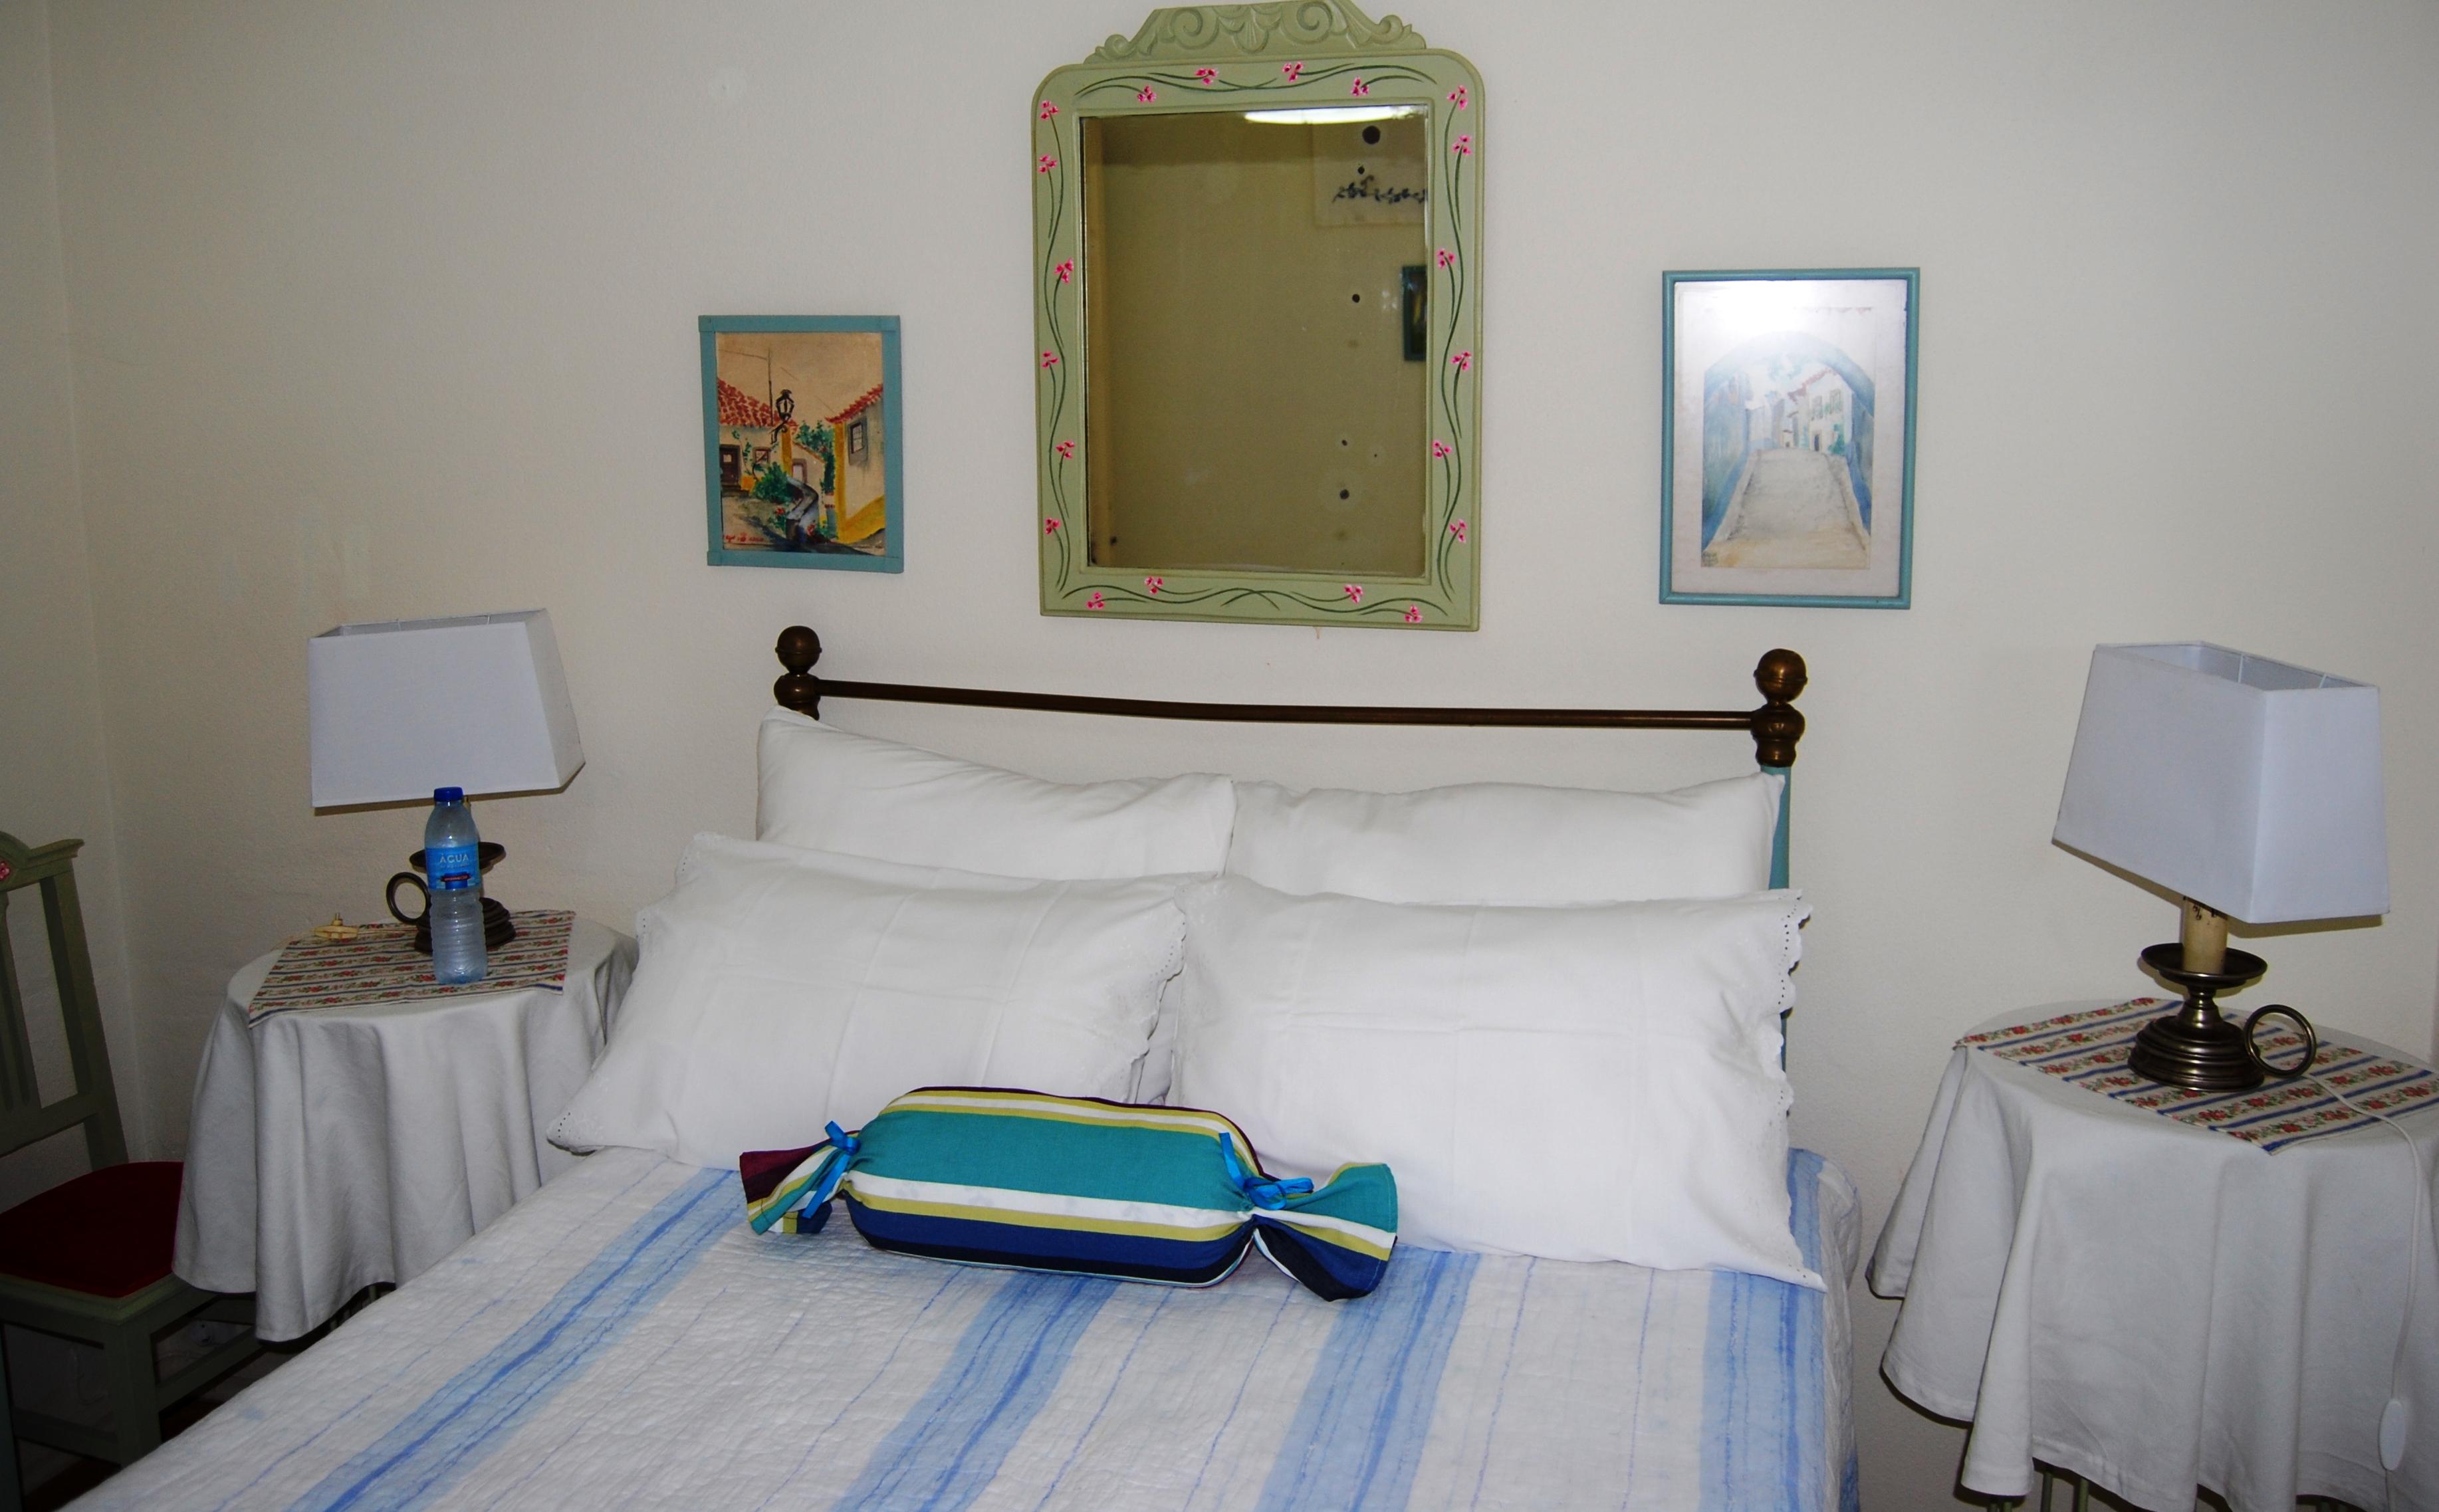 Holiday house Casa Maria d'Obidos - Ferienhaus - 3 Schlafzimmer, 2 Badezimmer, 6 (2599548), Óbidos, Costa de Prata, Central-Portugal, Portugal, picture 12